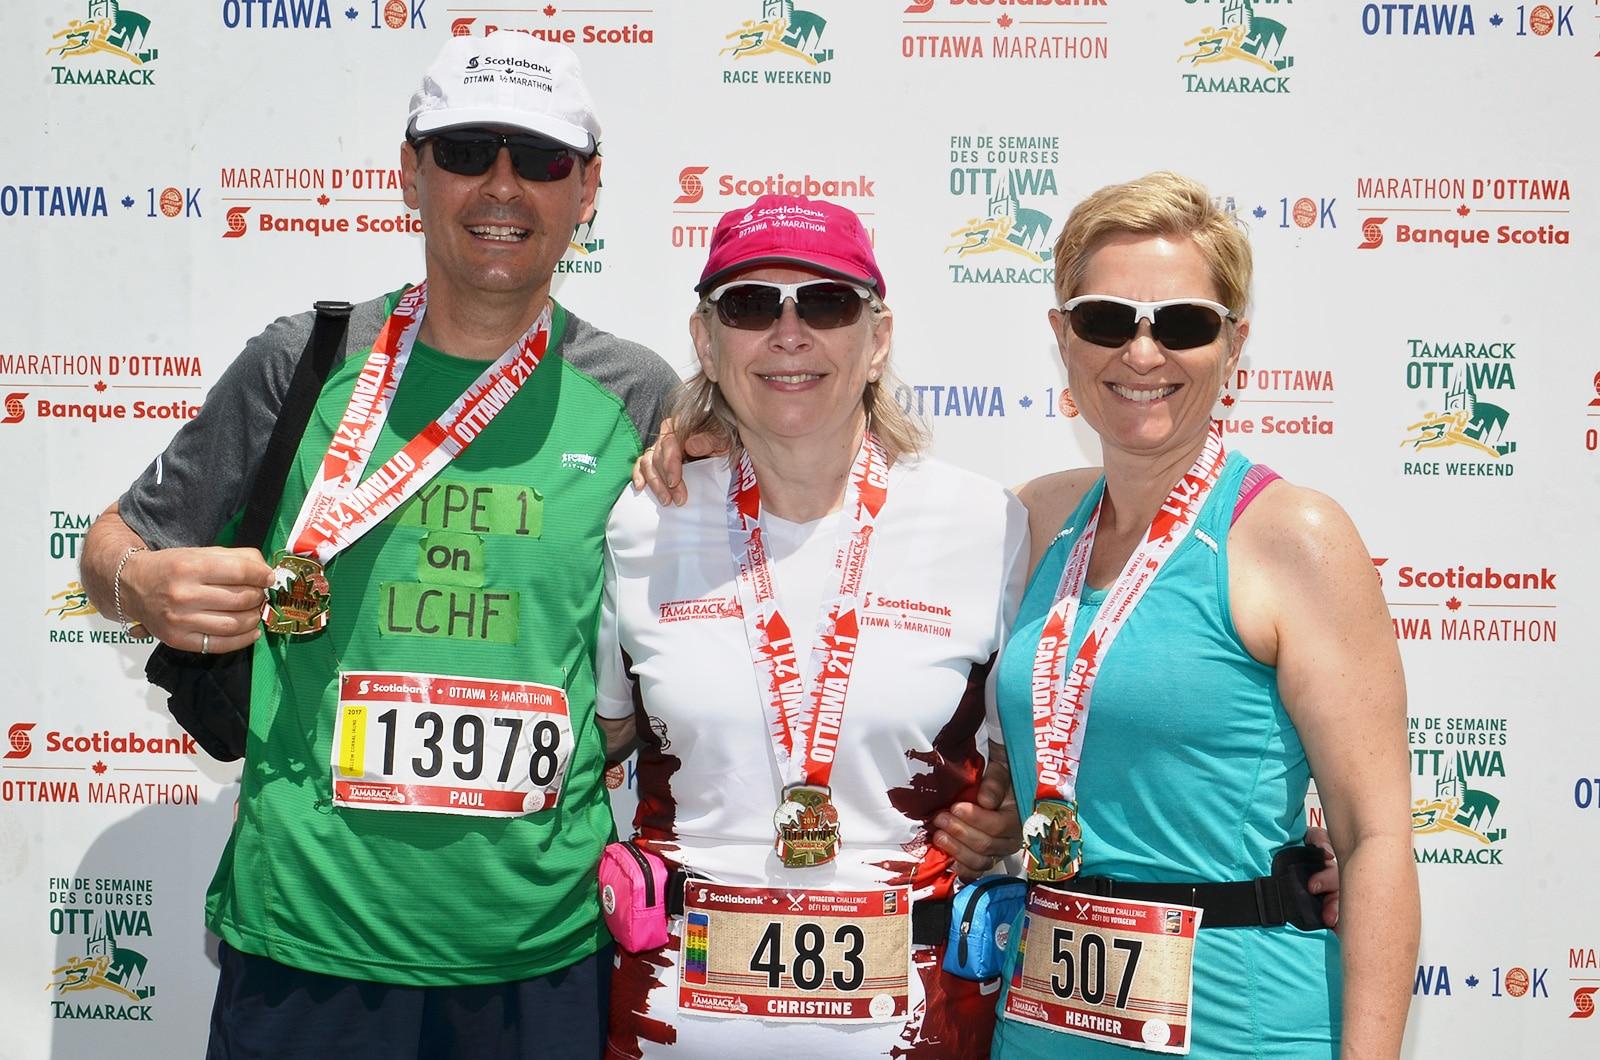 Ottawa Race Weekend 2017